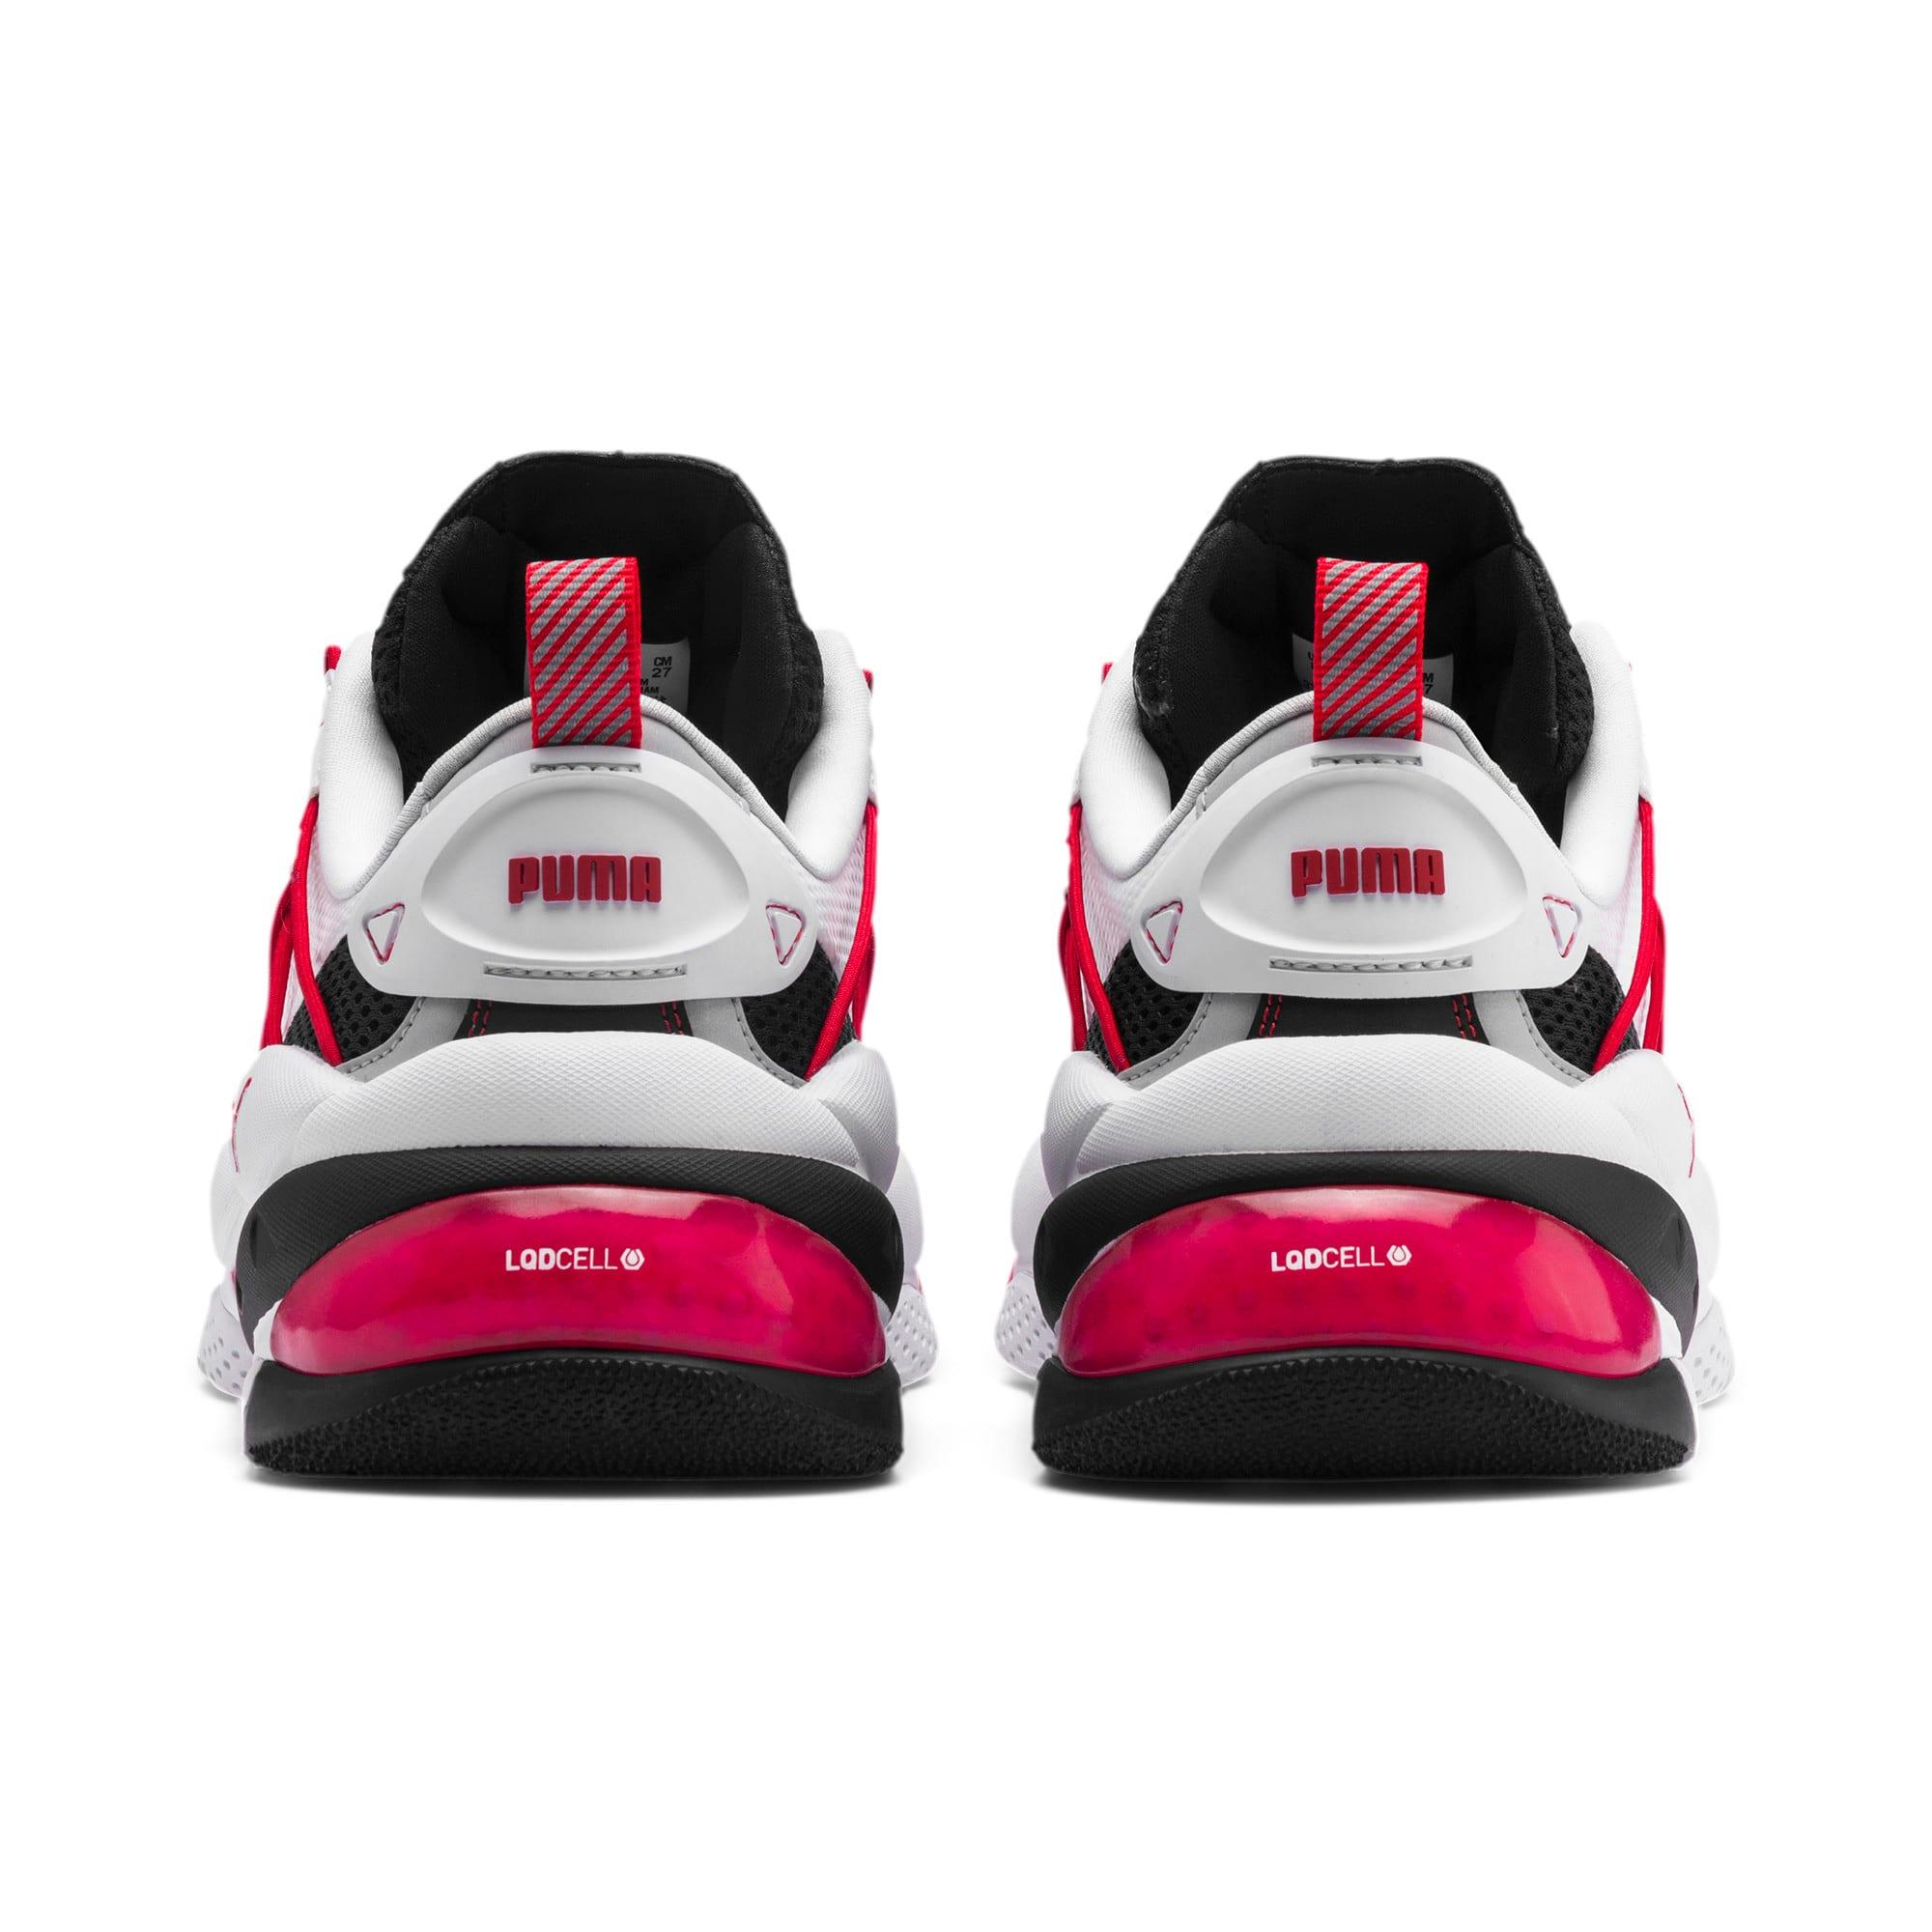 Thumbnail 3 of LQDCELL Omega Sneaker, Puma Black-Puma White, medium